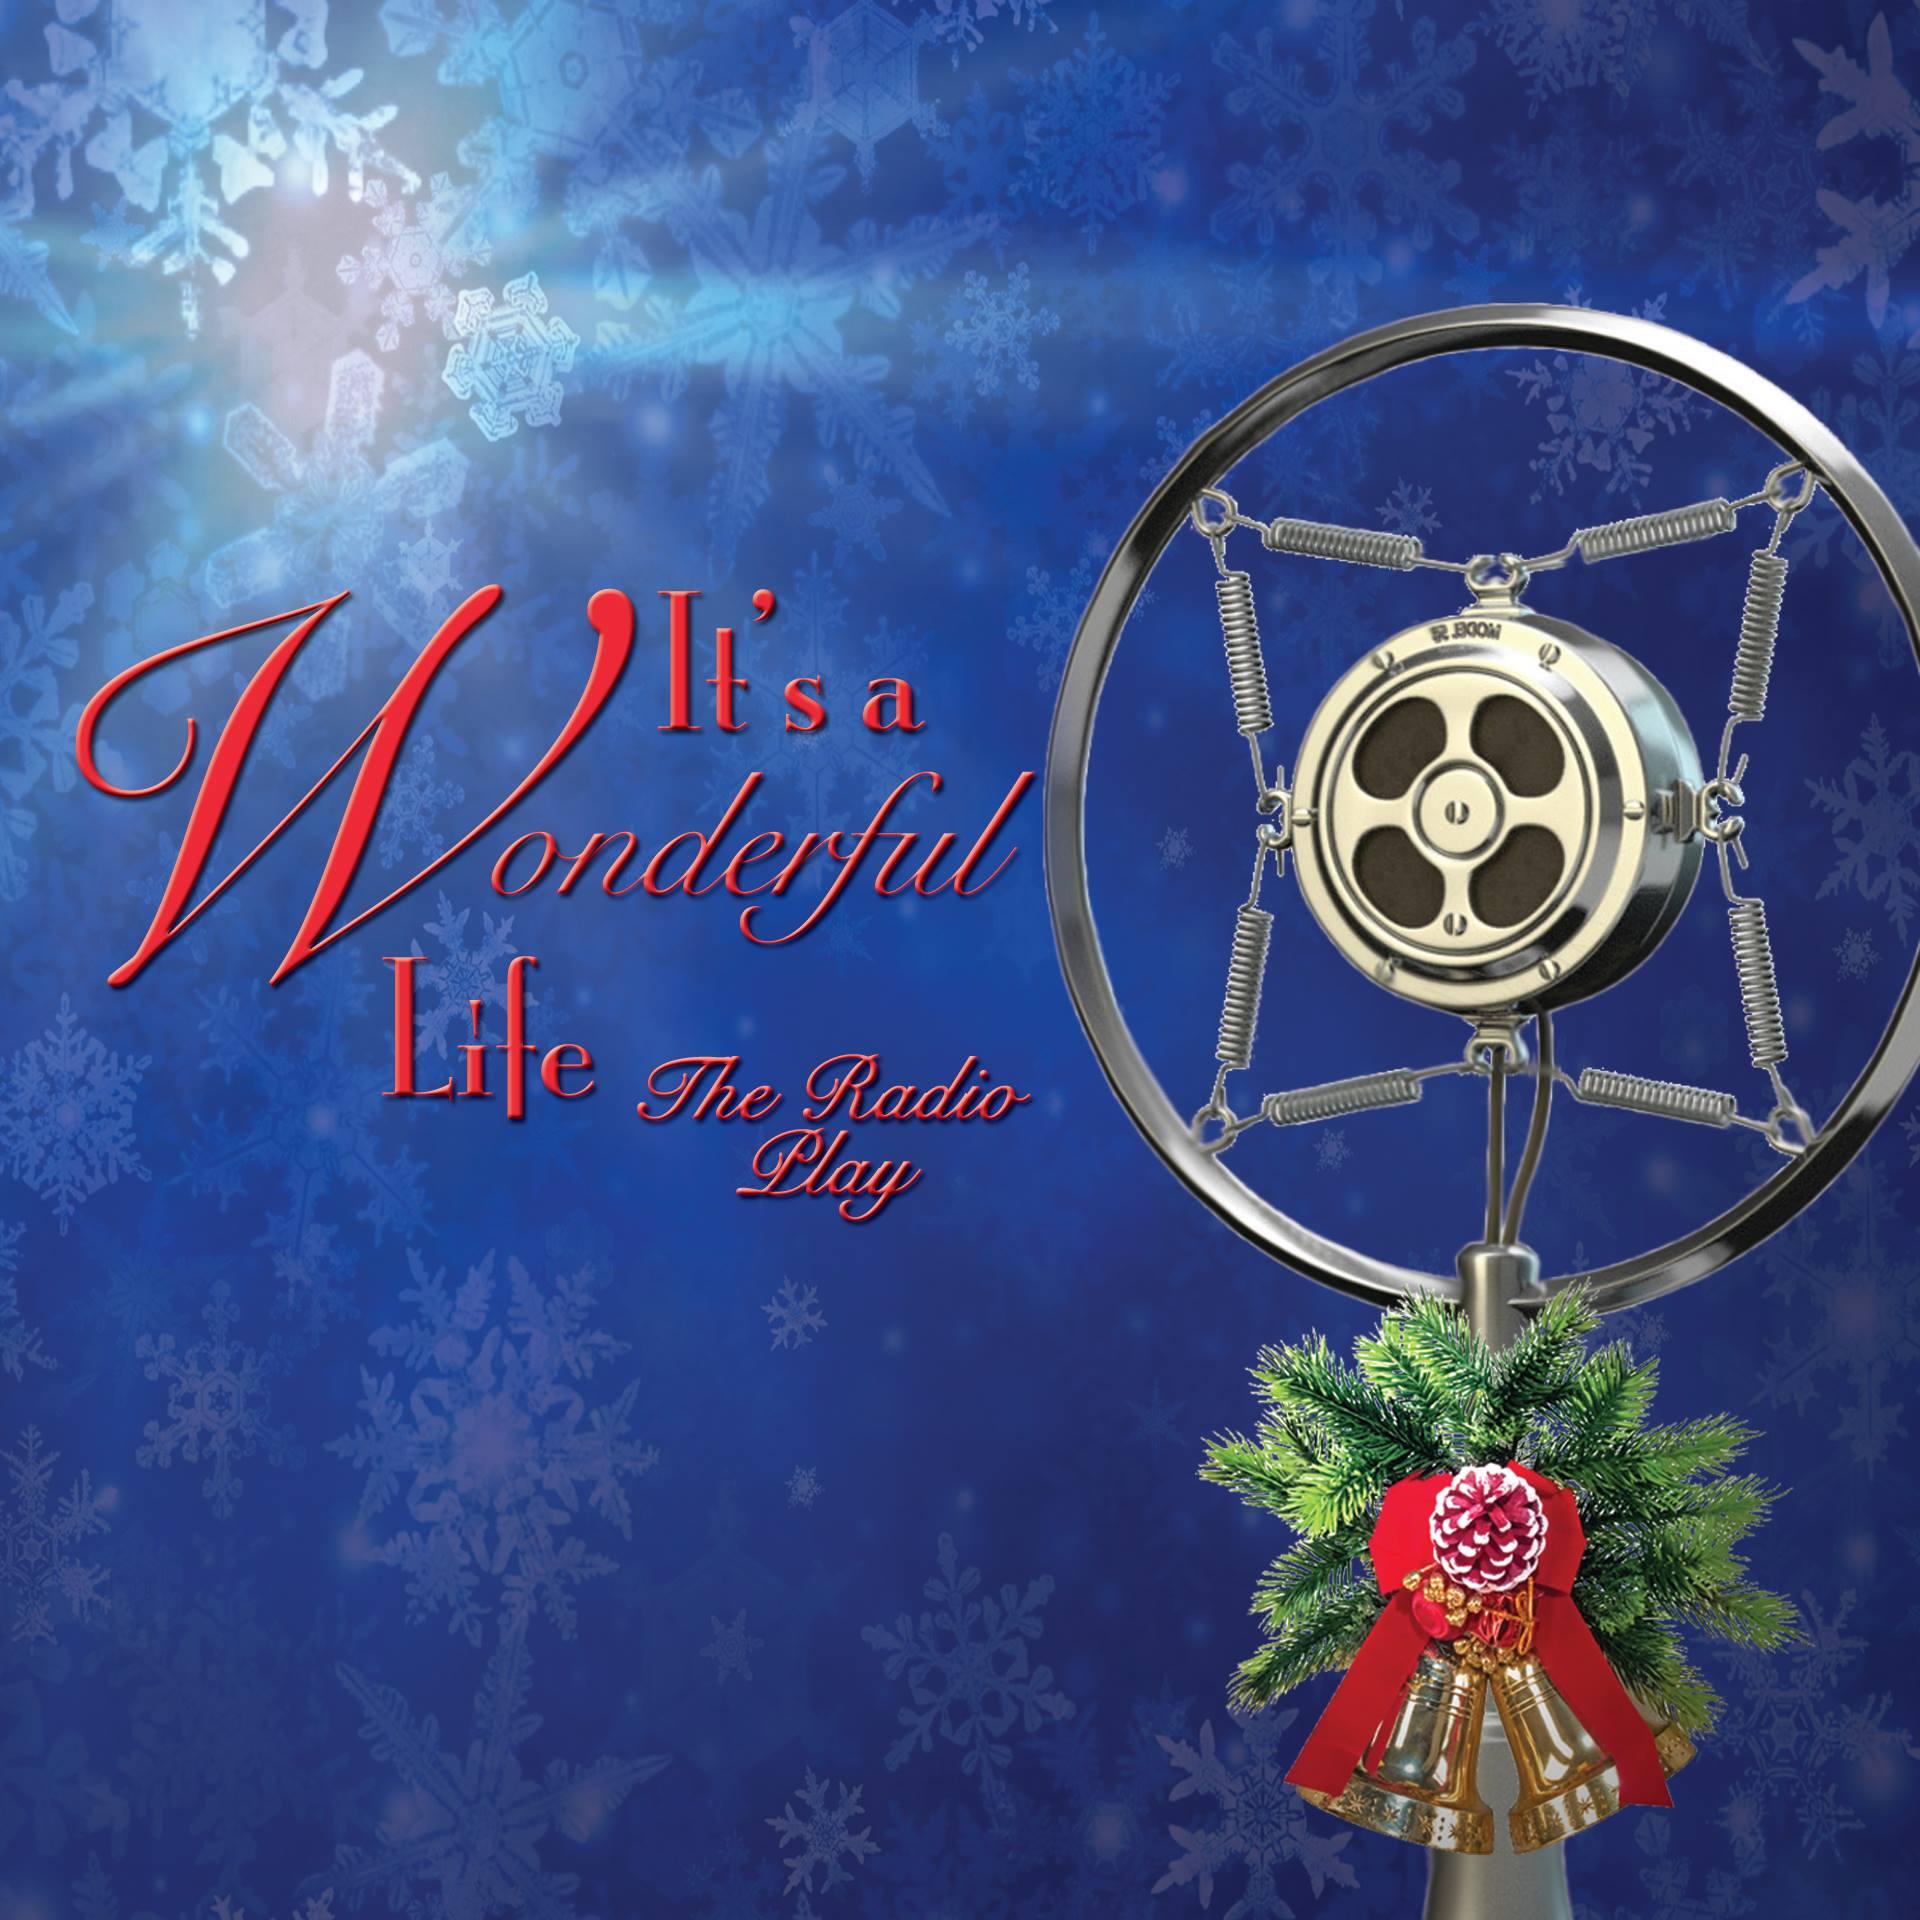 NoHo Christmas Show Guide www.nohoartsdistrict.com